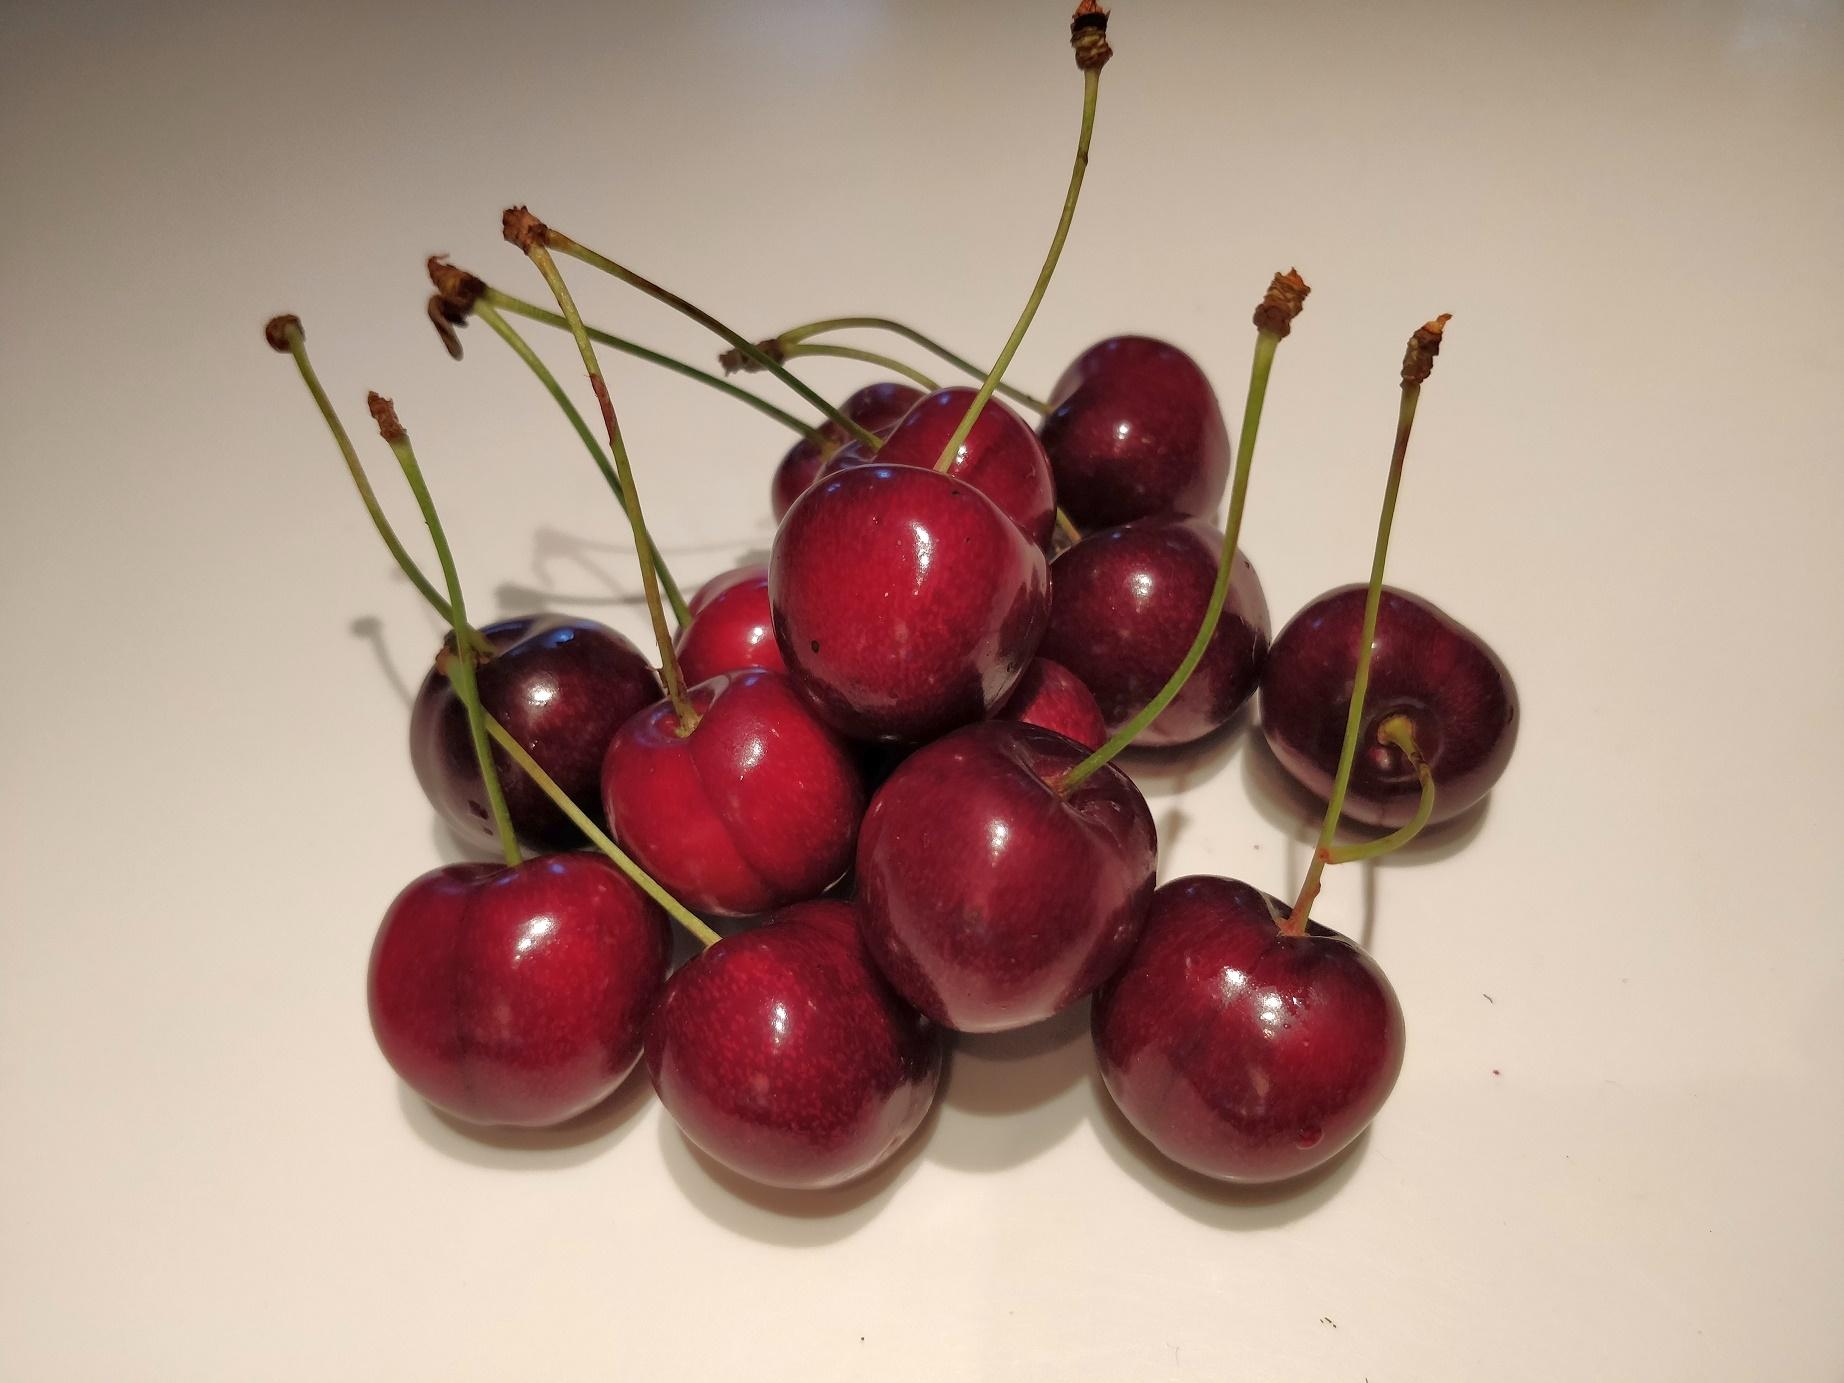 Kirsebær eller moreller til en kage